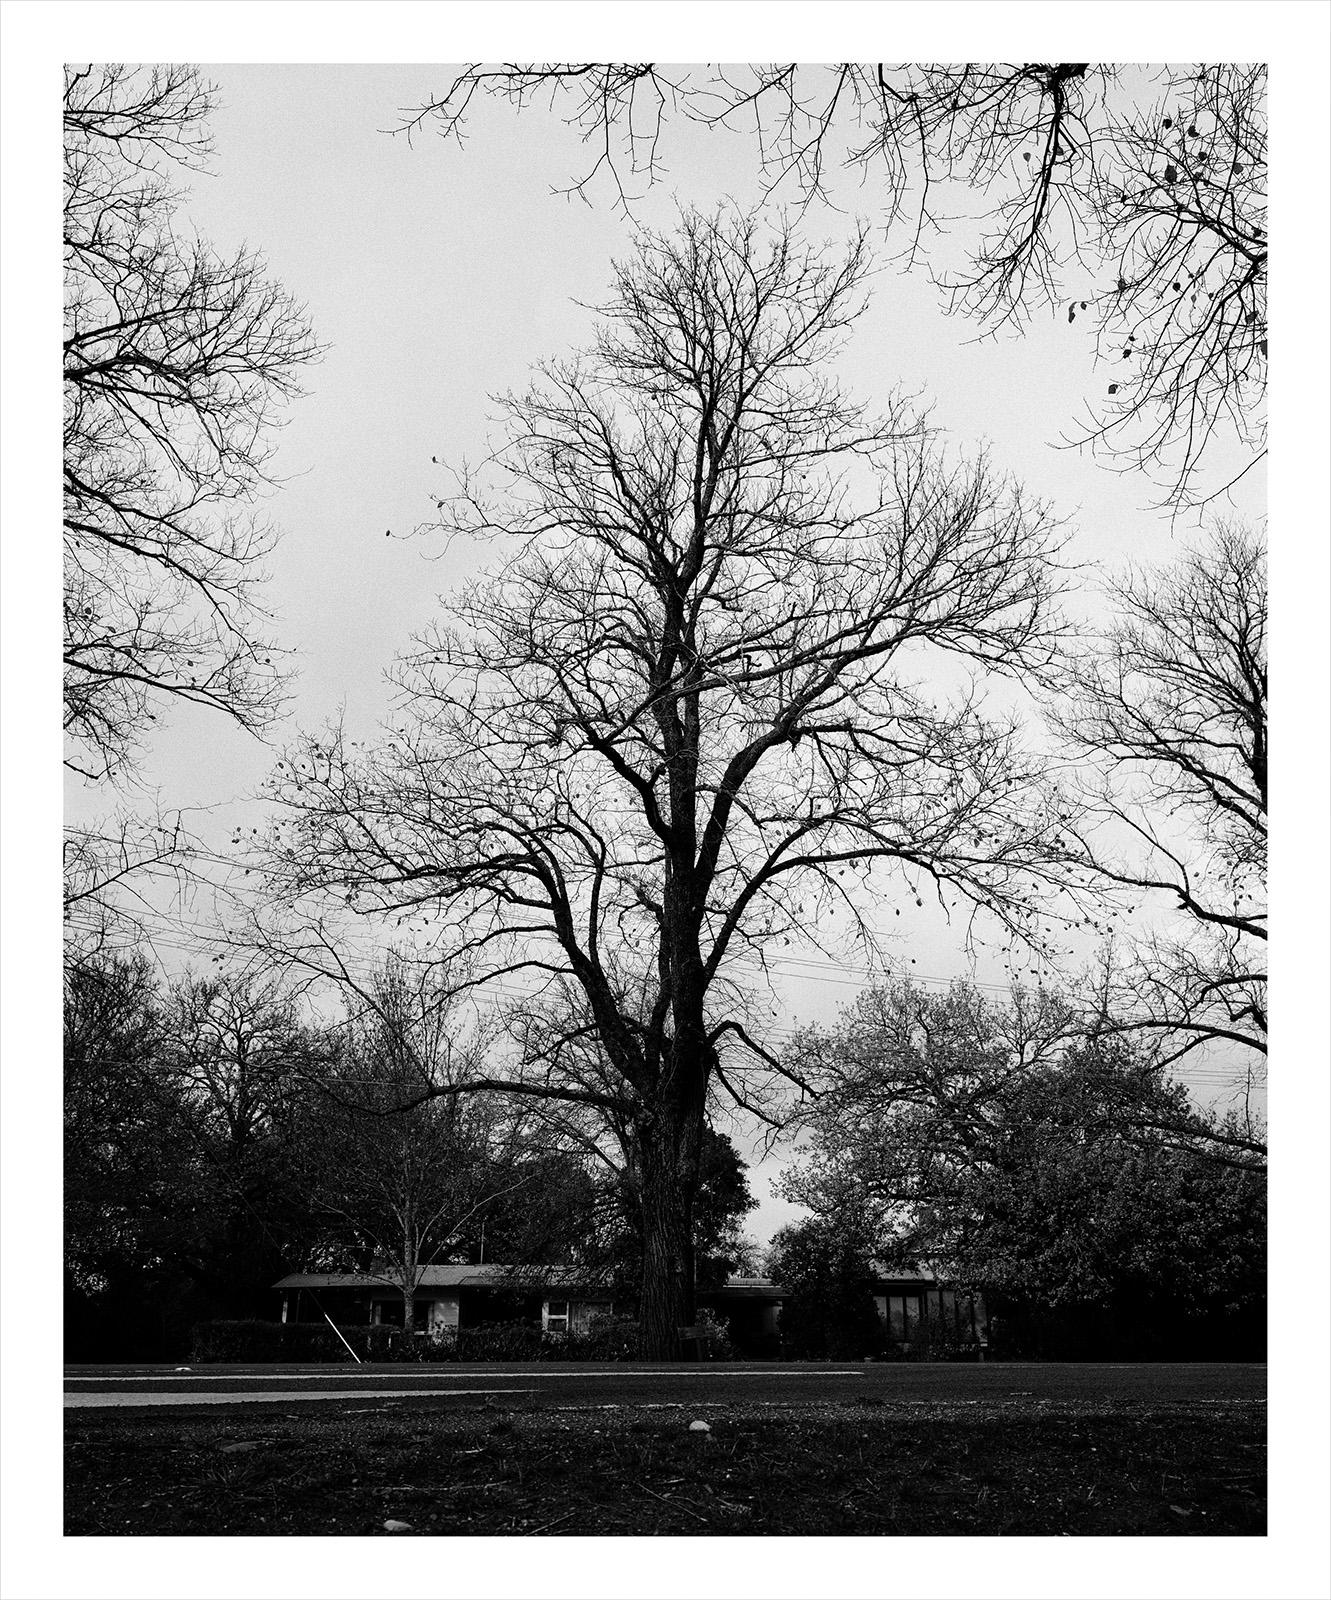 Tree 81 Greenwood.jpg